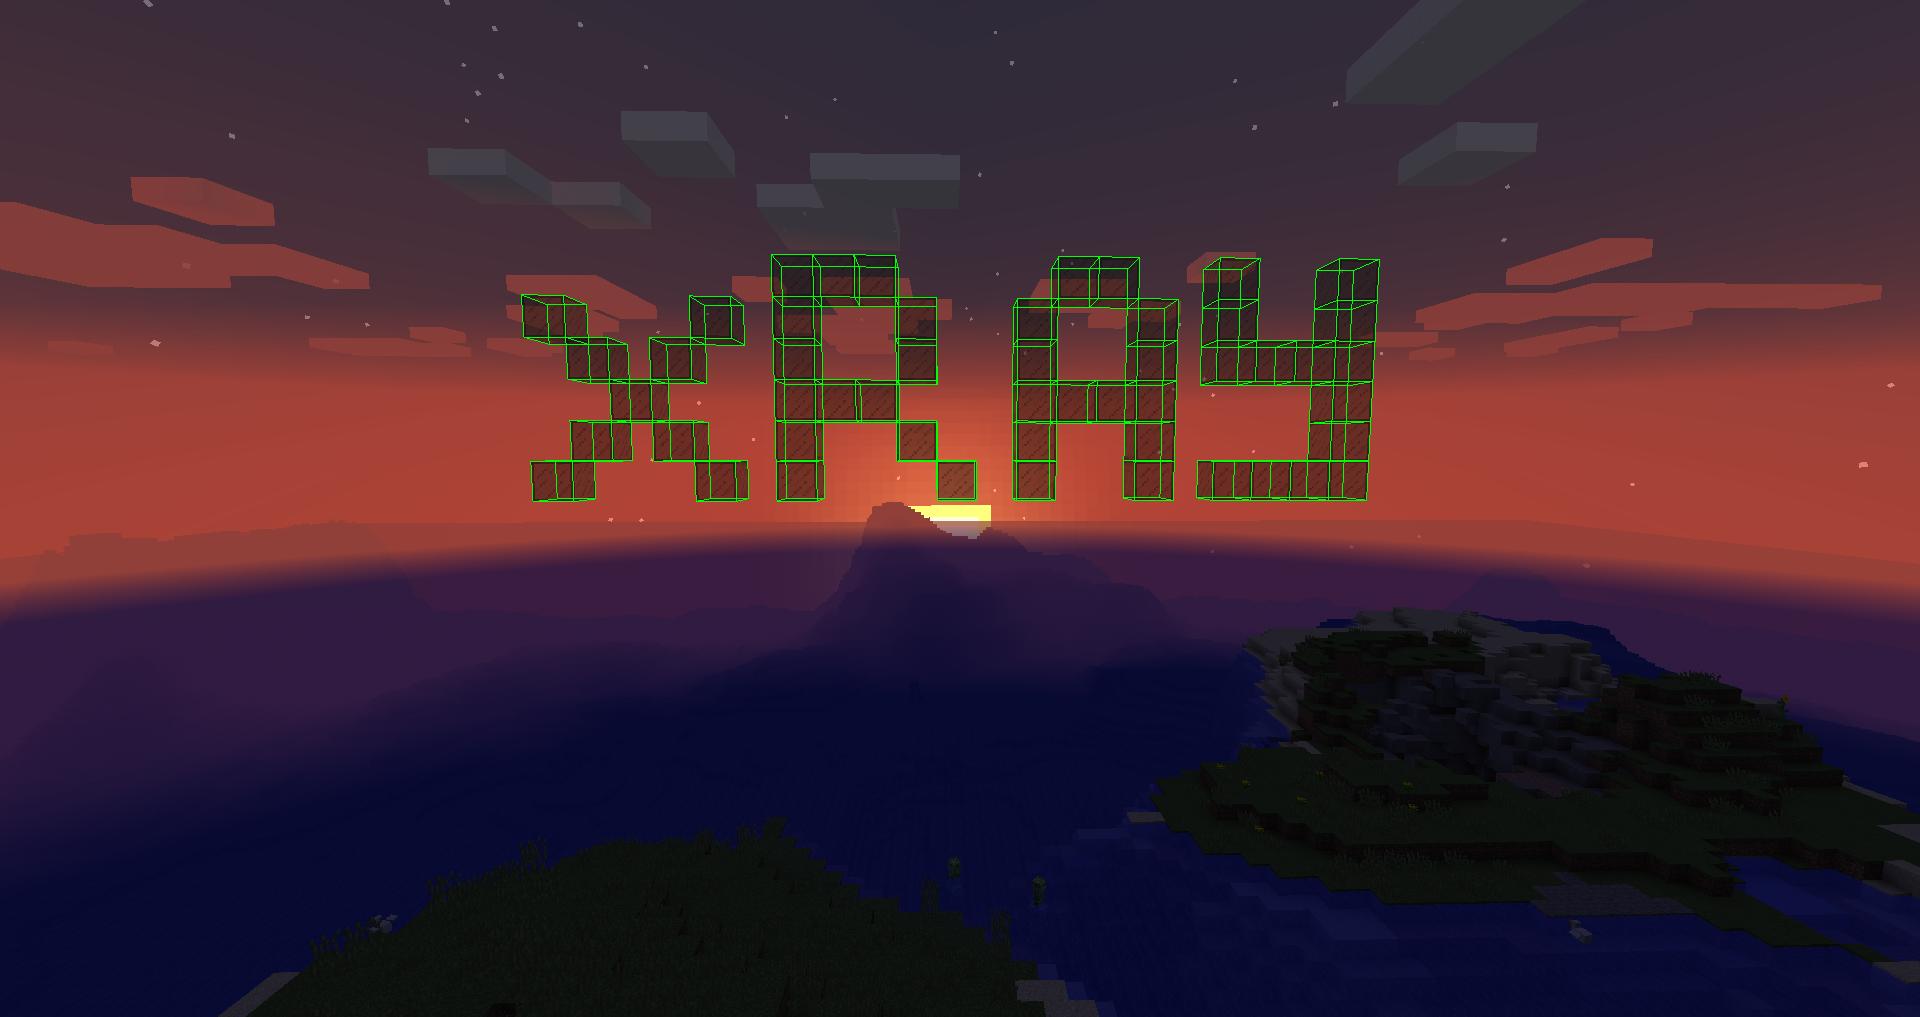 minecraft xray mod 1.8 forge download